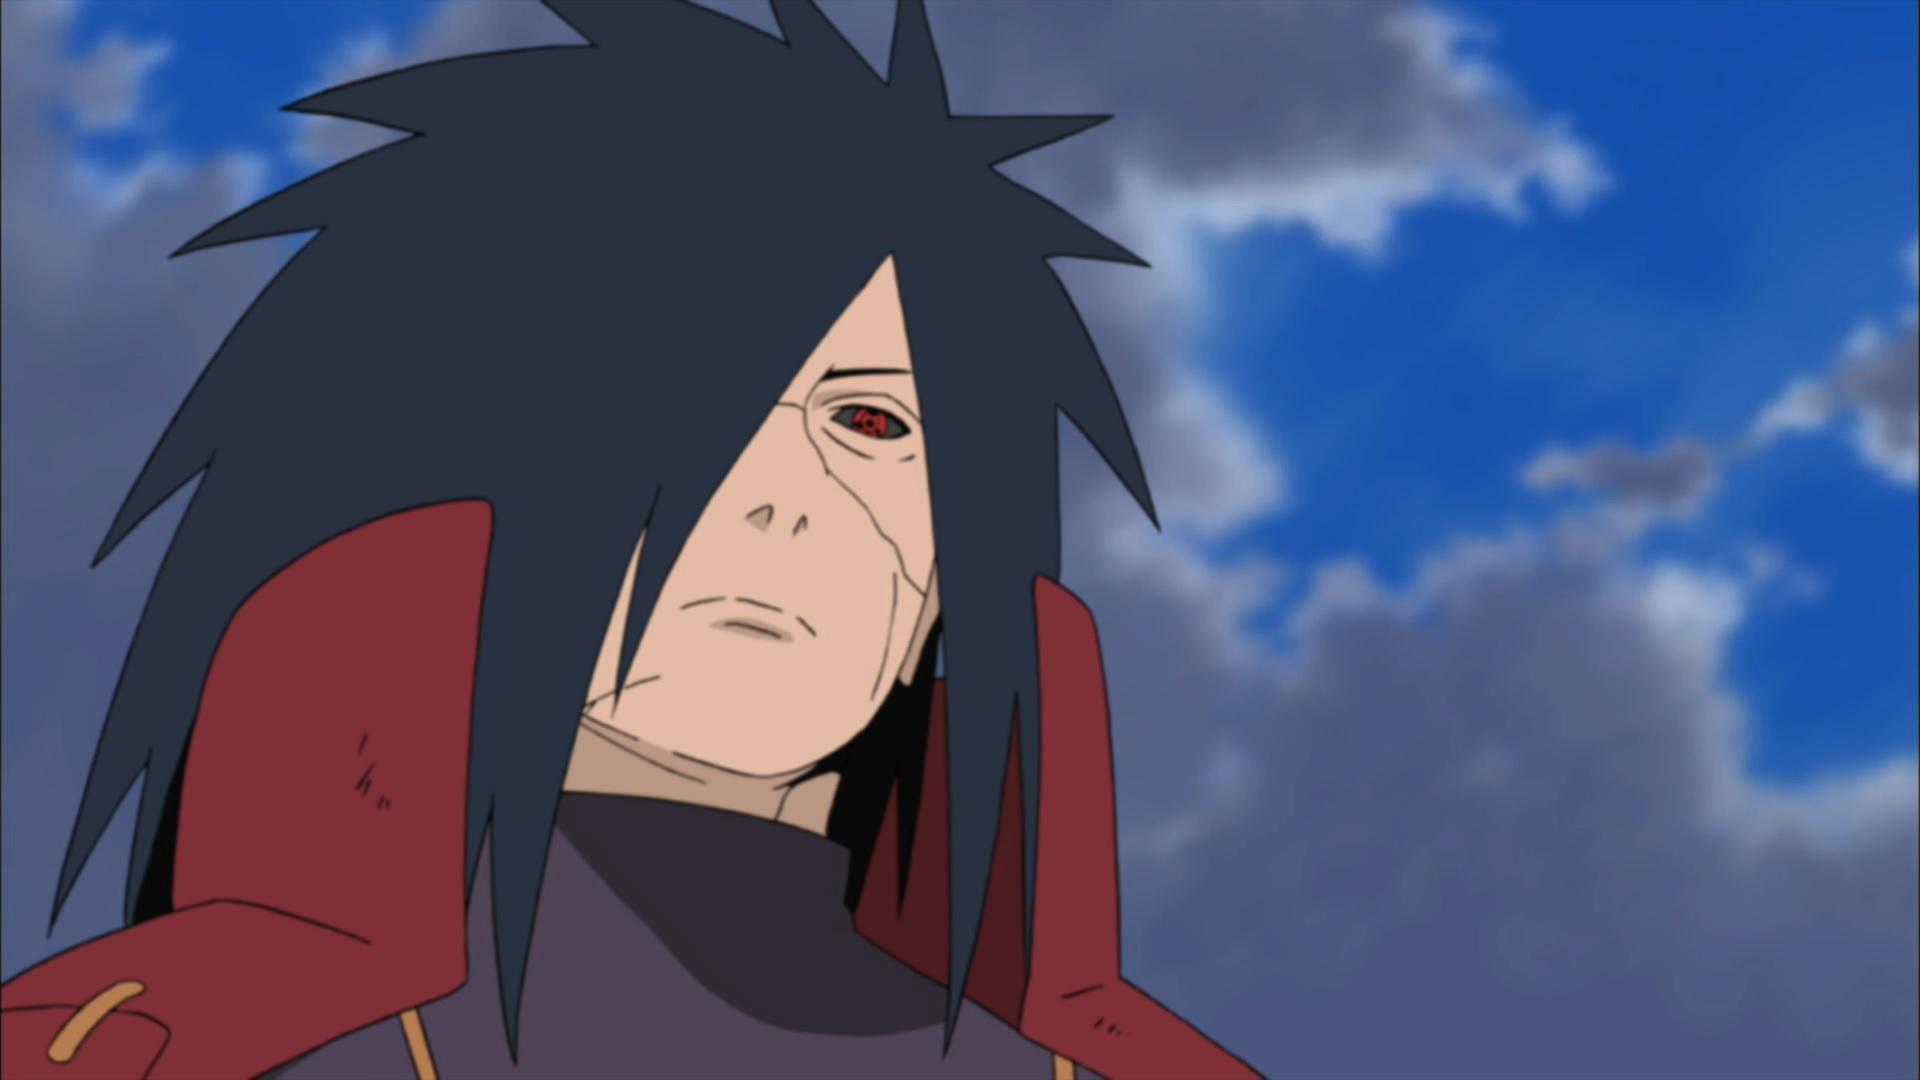 Fighting Wallpaper Hd Madara Uchiha Hero Preview Feature Naruto Wars Reborn